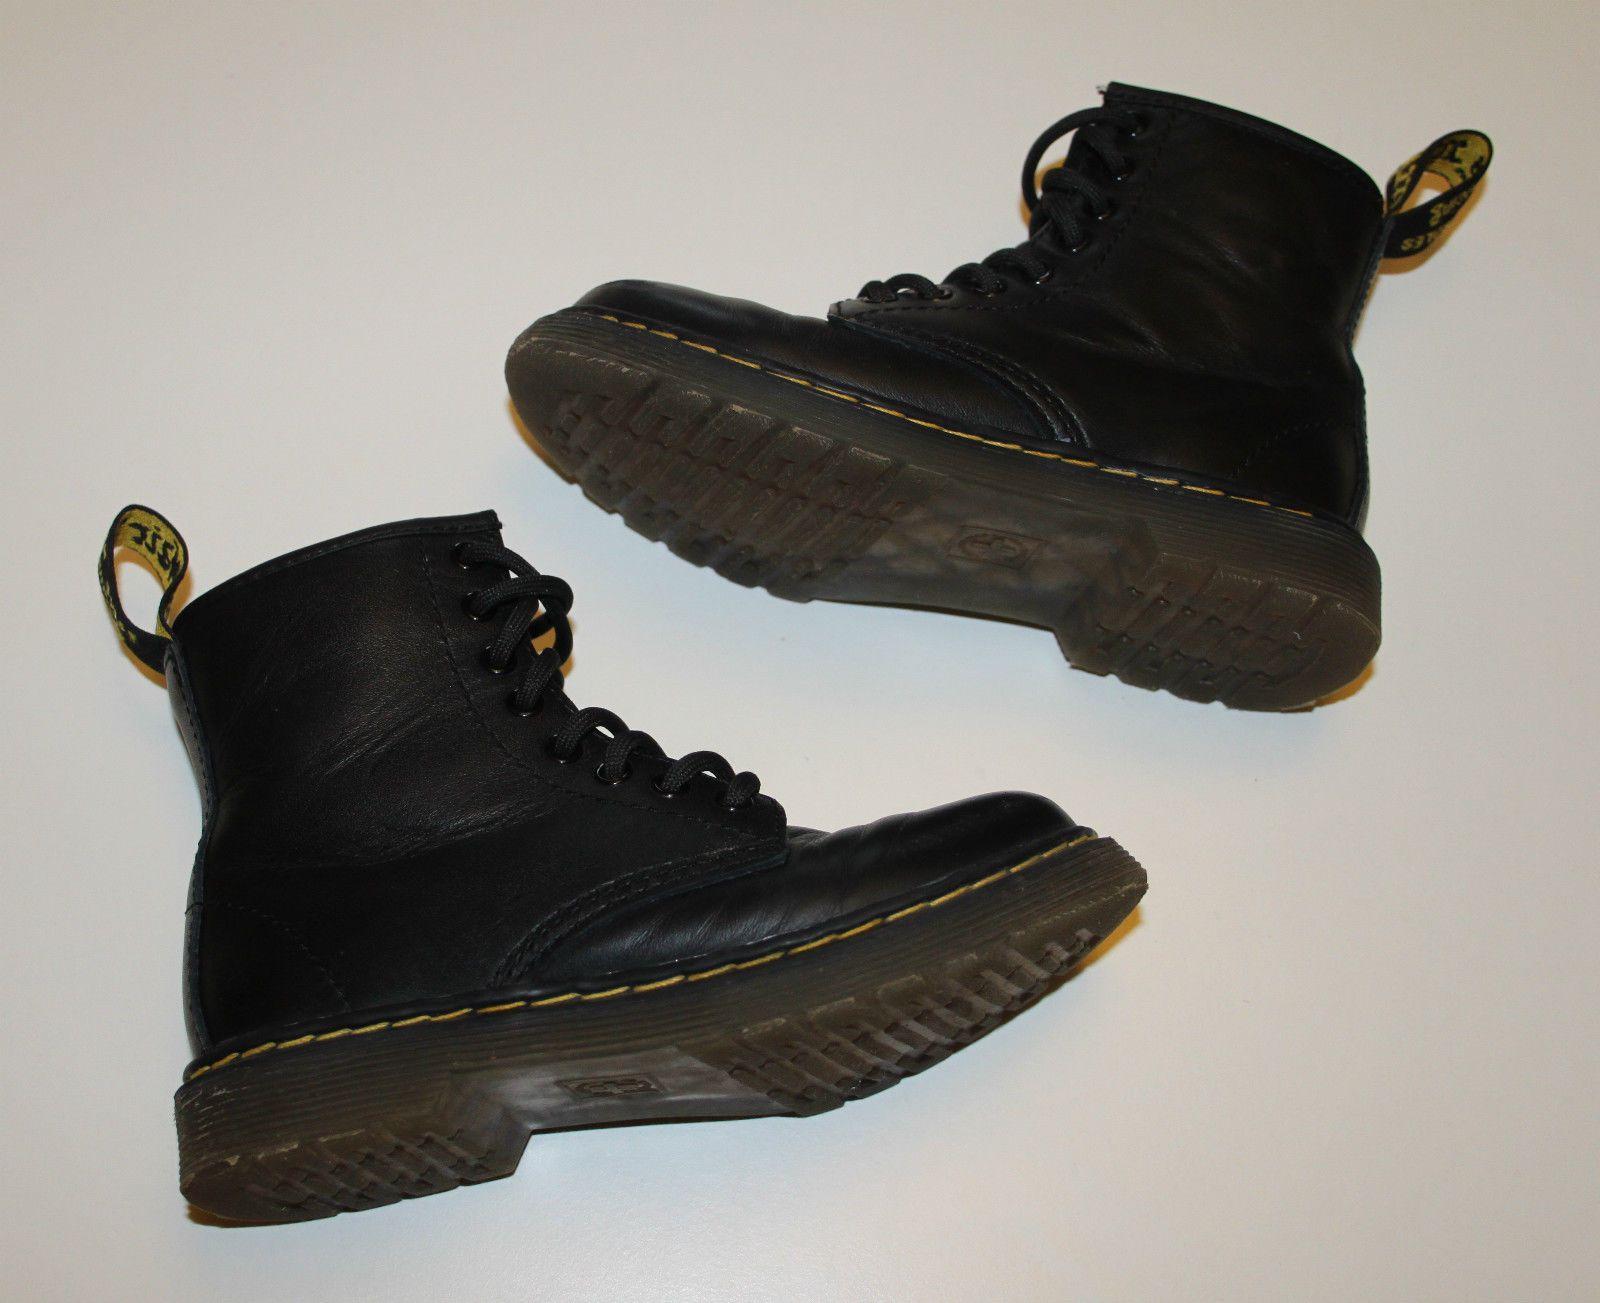 323d85306188 Dr Martens DELANEY Junior Lace-up AirWair Bouncing Soles Boots Size UK 10  EU 28 in Clothes